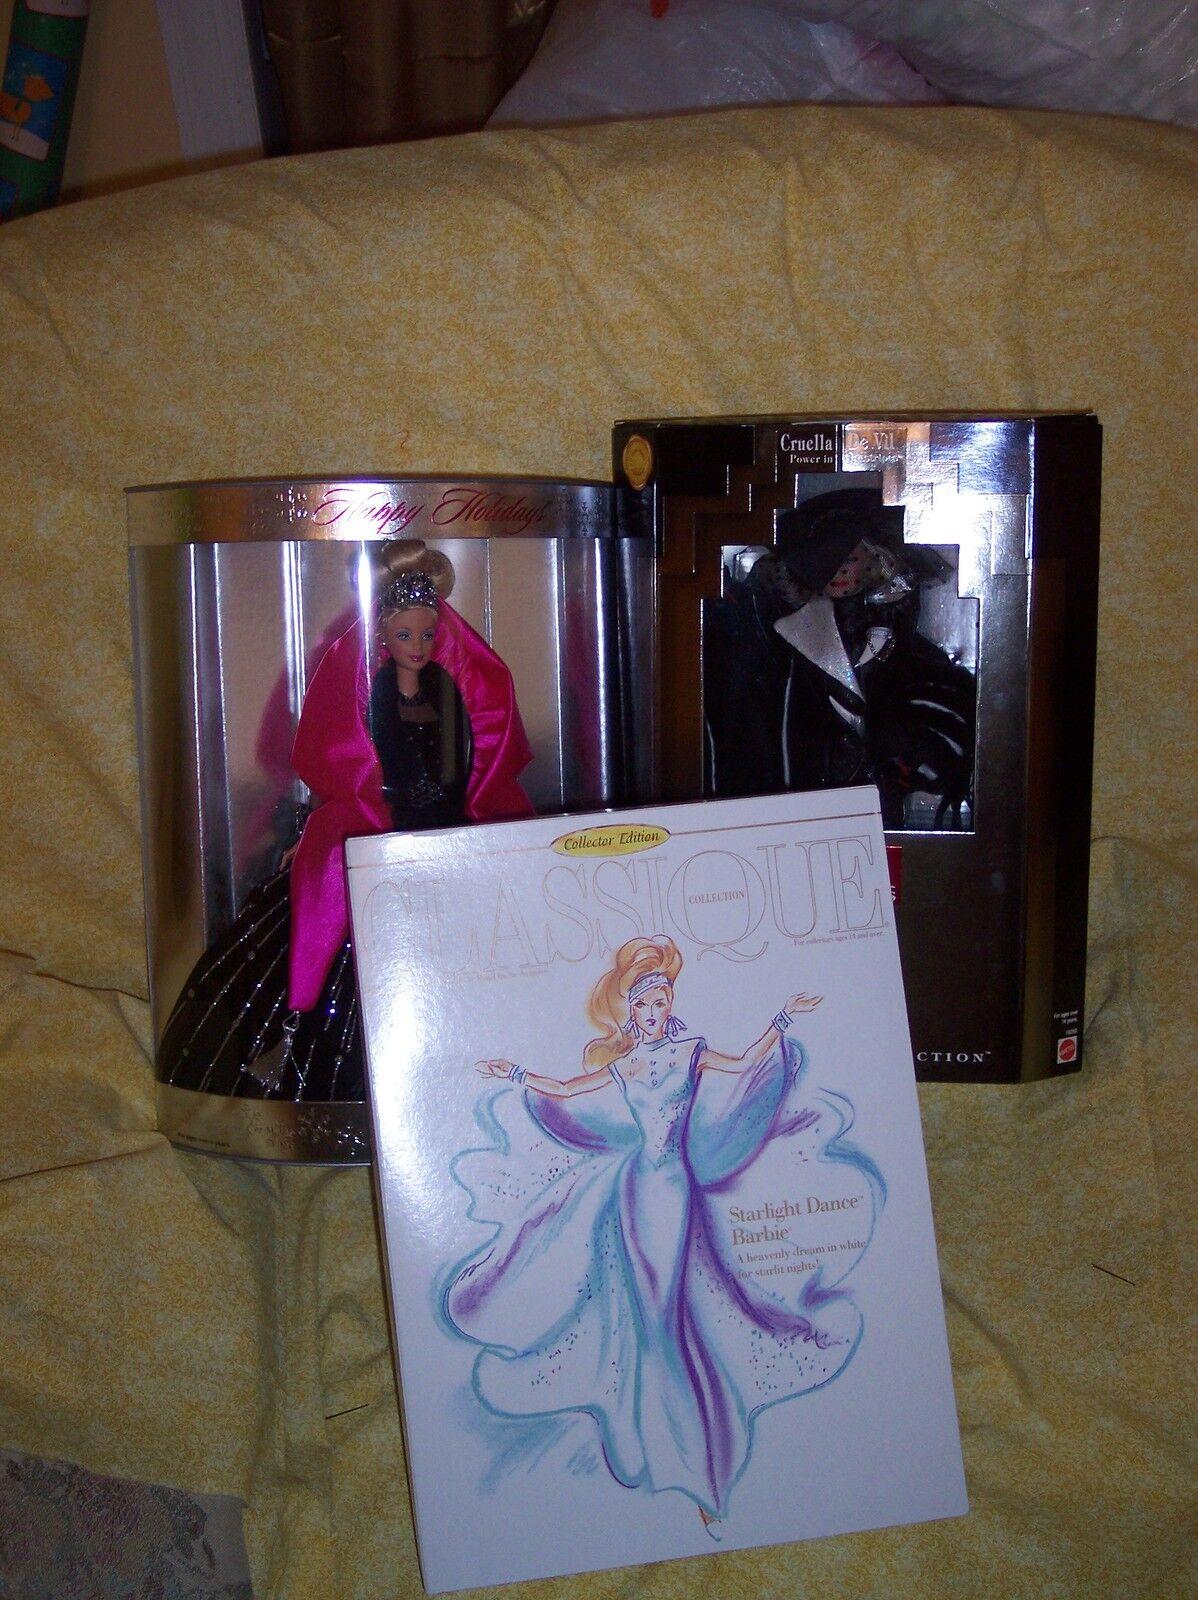 Lote De Barbies  Barbie Cruela De Vil, Starlight Dancer y Felices Fiestas 1998